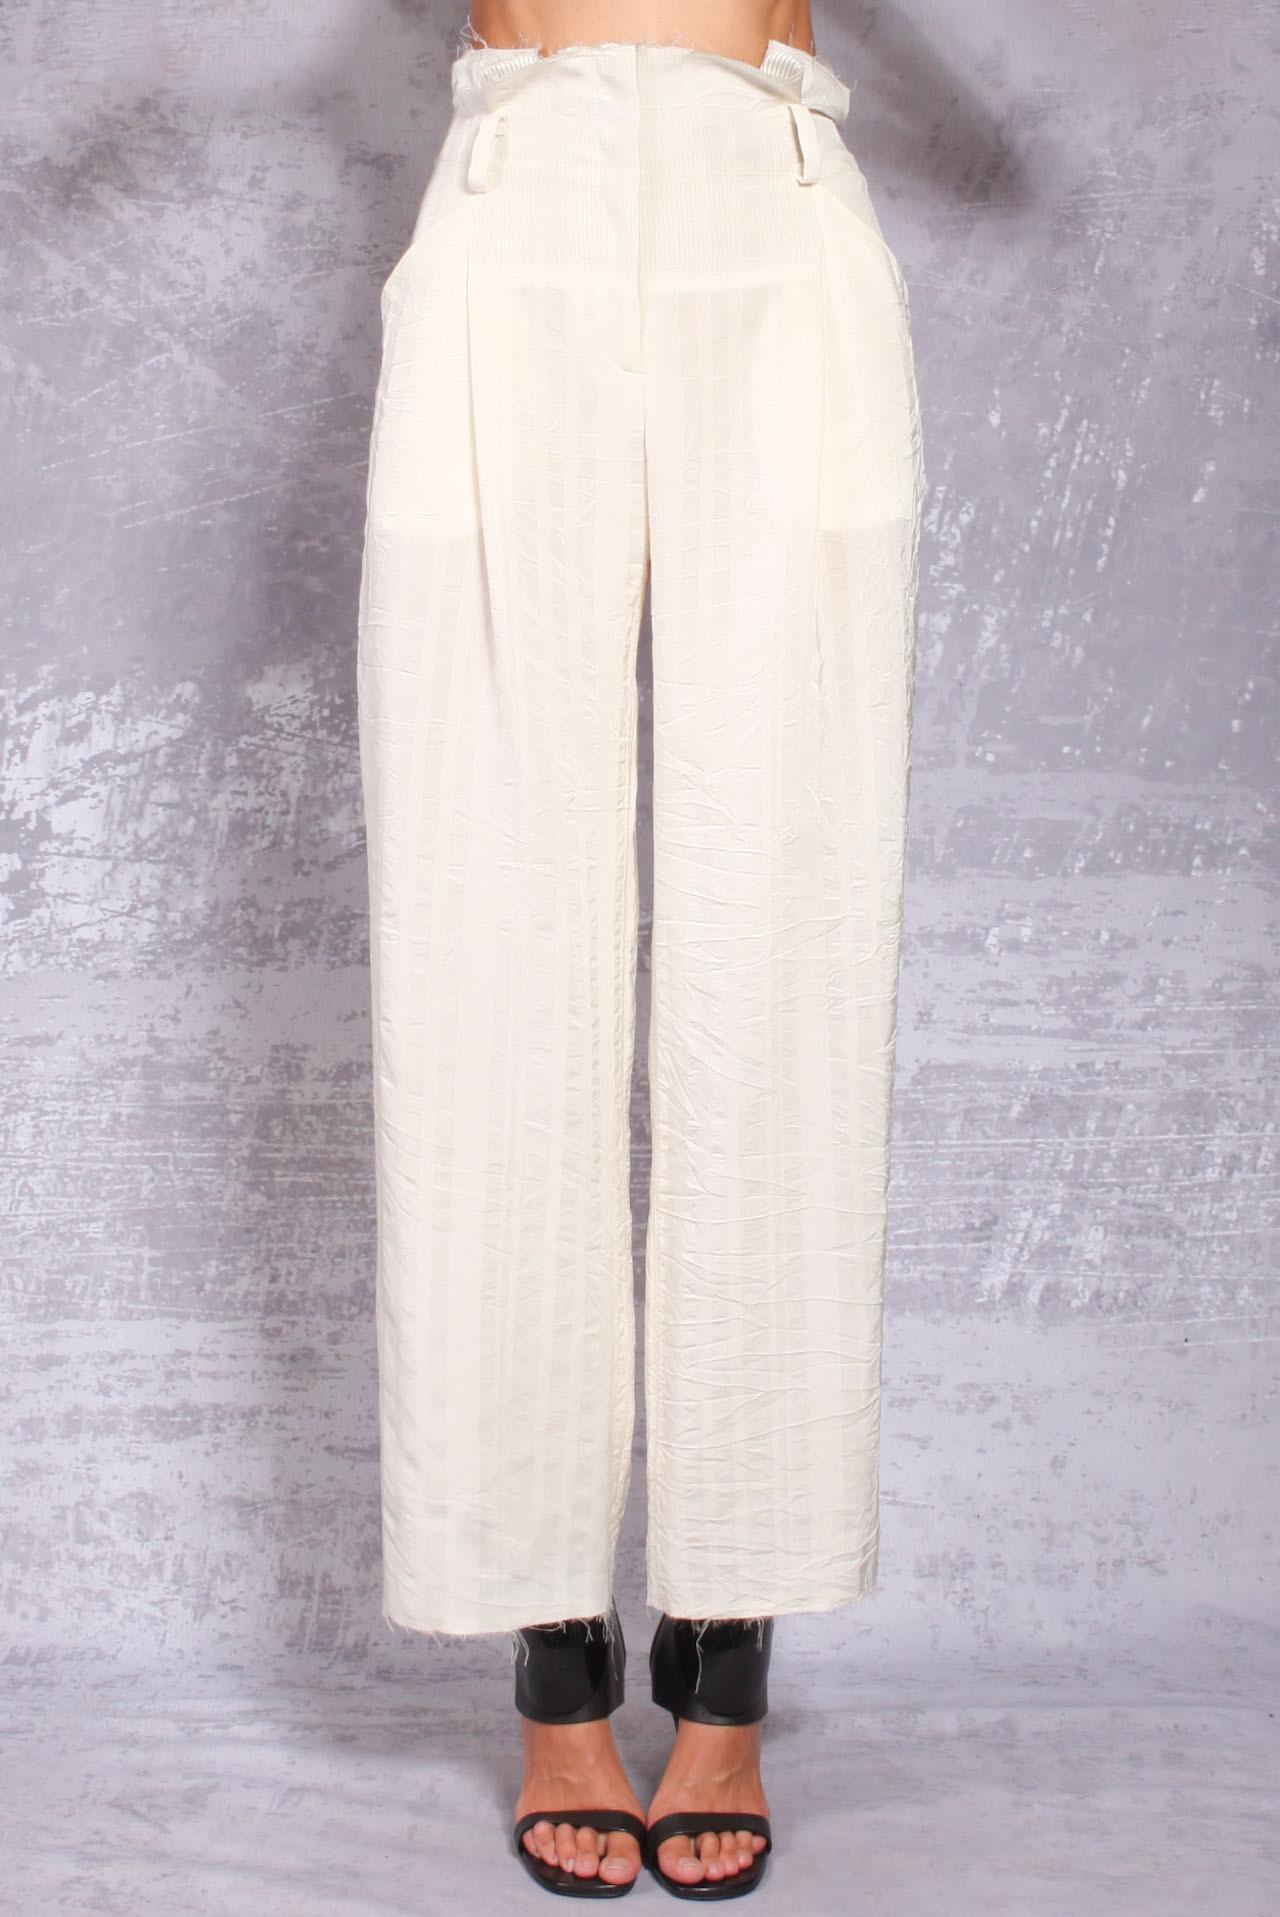 Alessandra Marchi pants